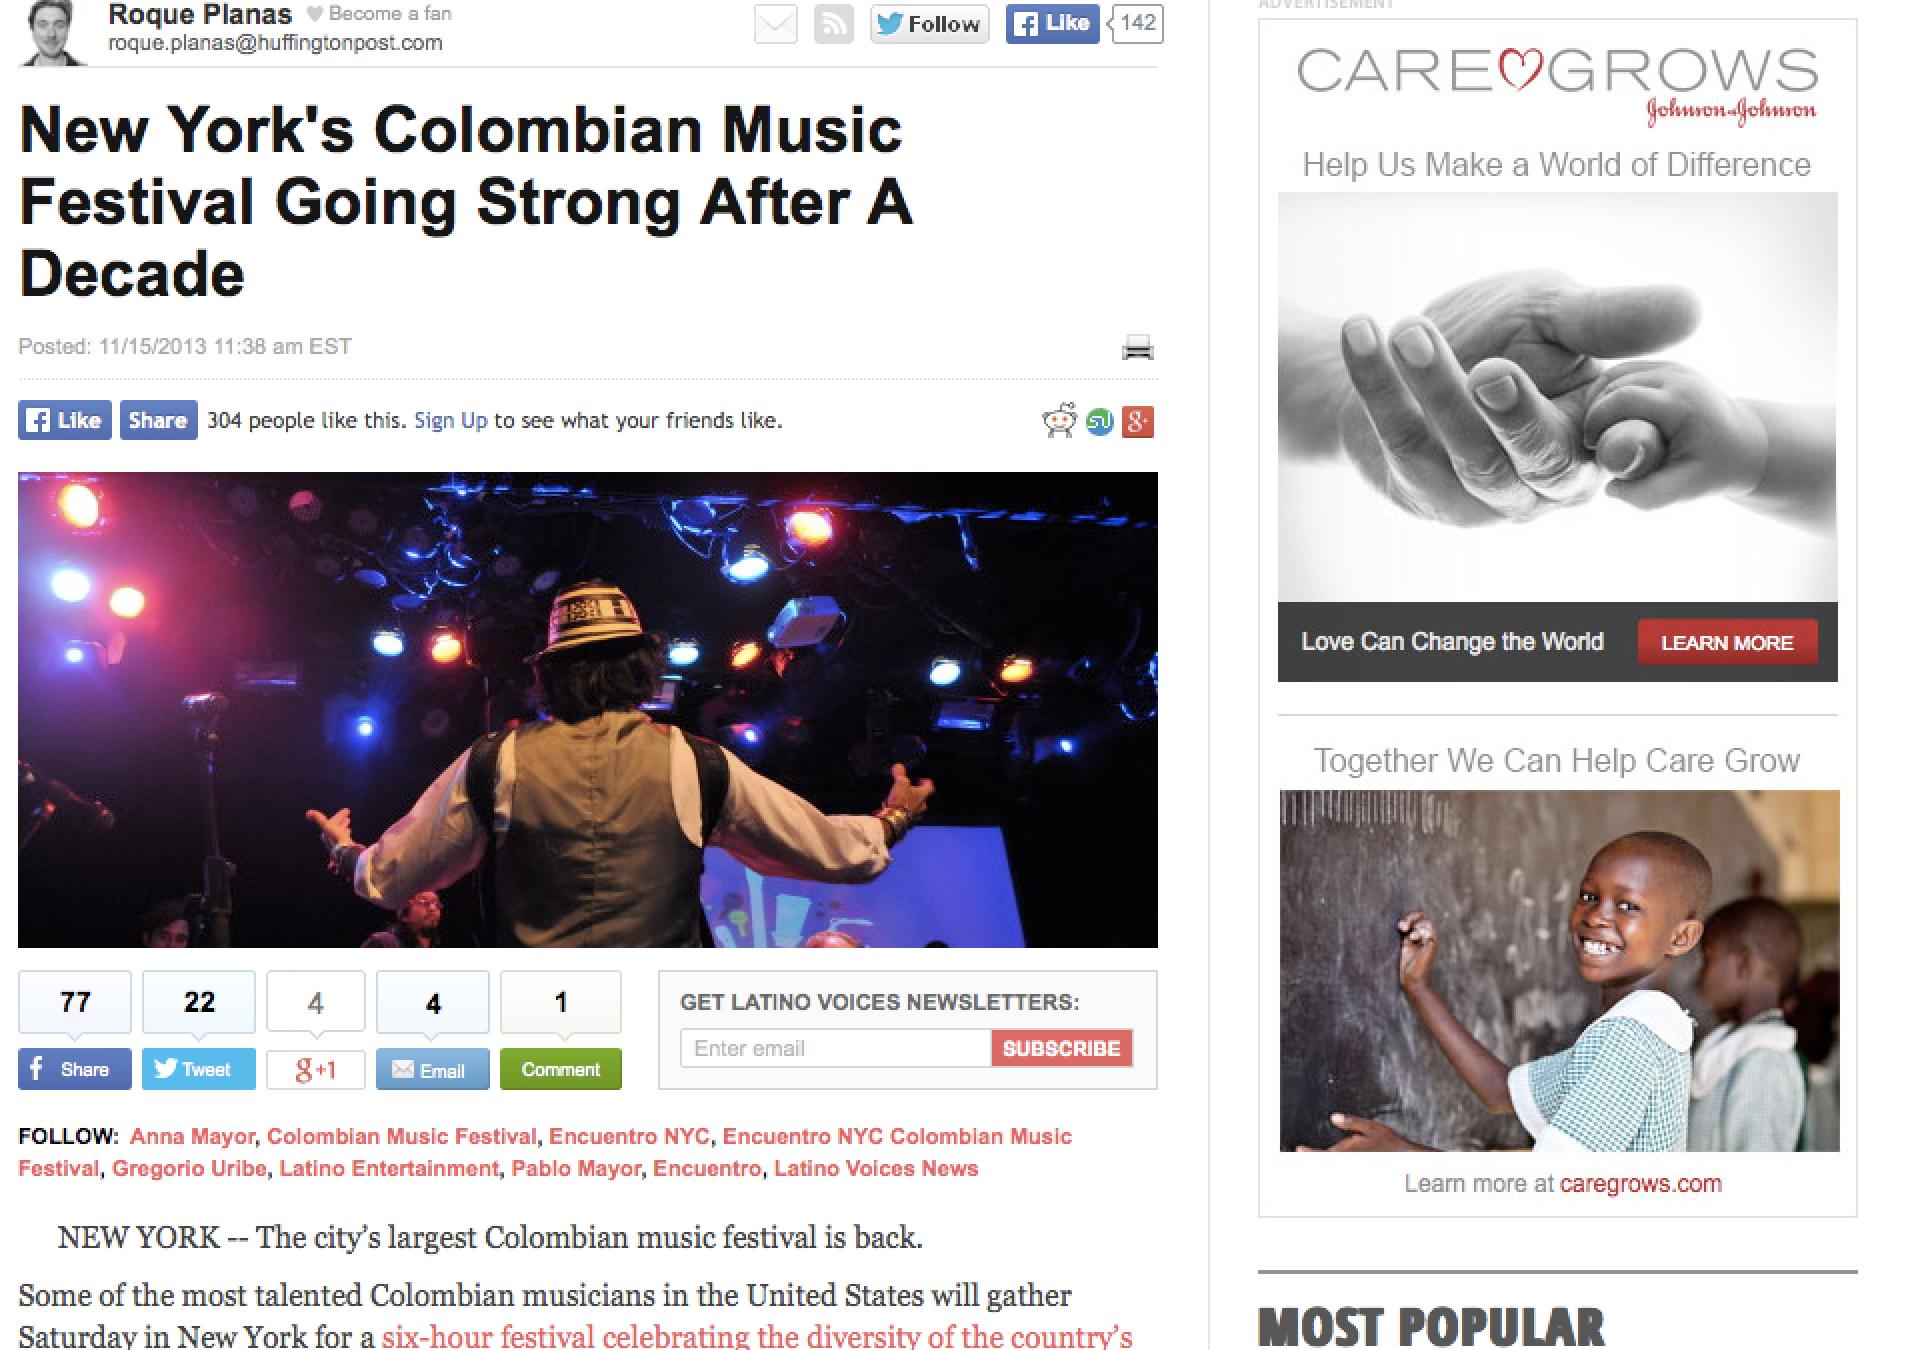 Huffington Post - Encuentro